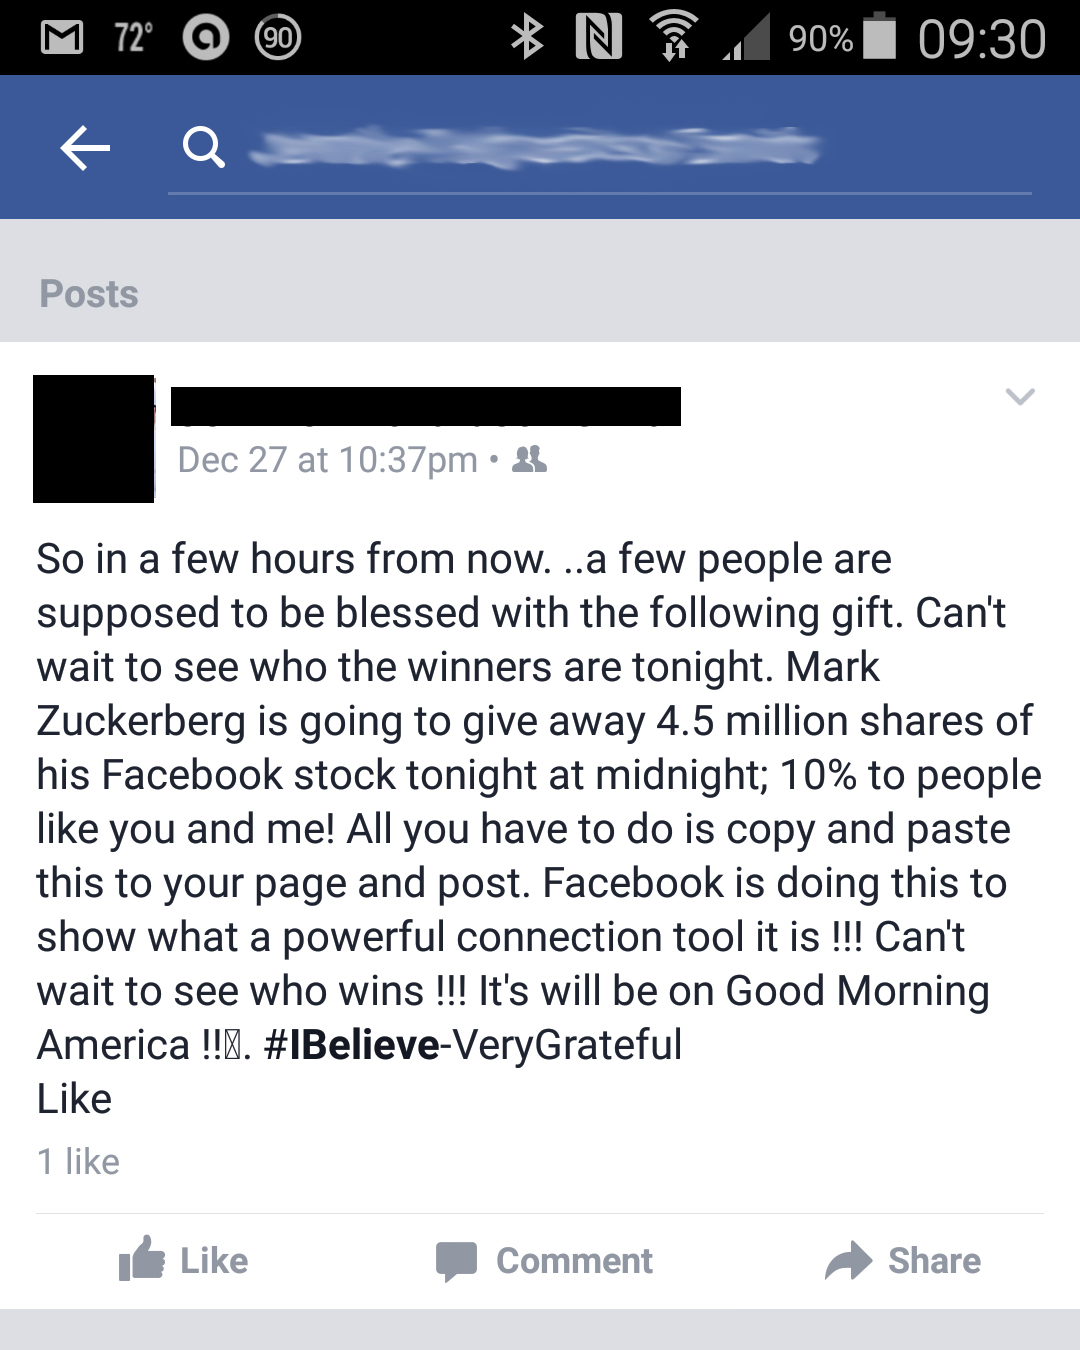 Good Morning America Zuckerberg Give Away : Hoax software